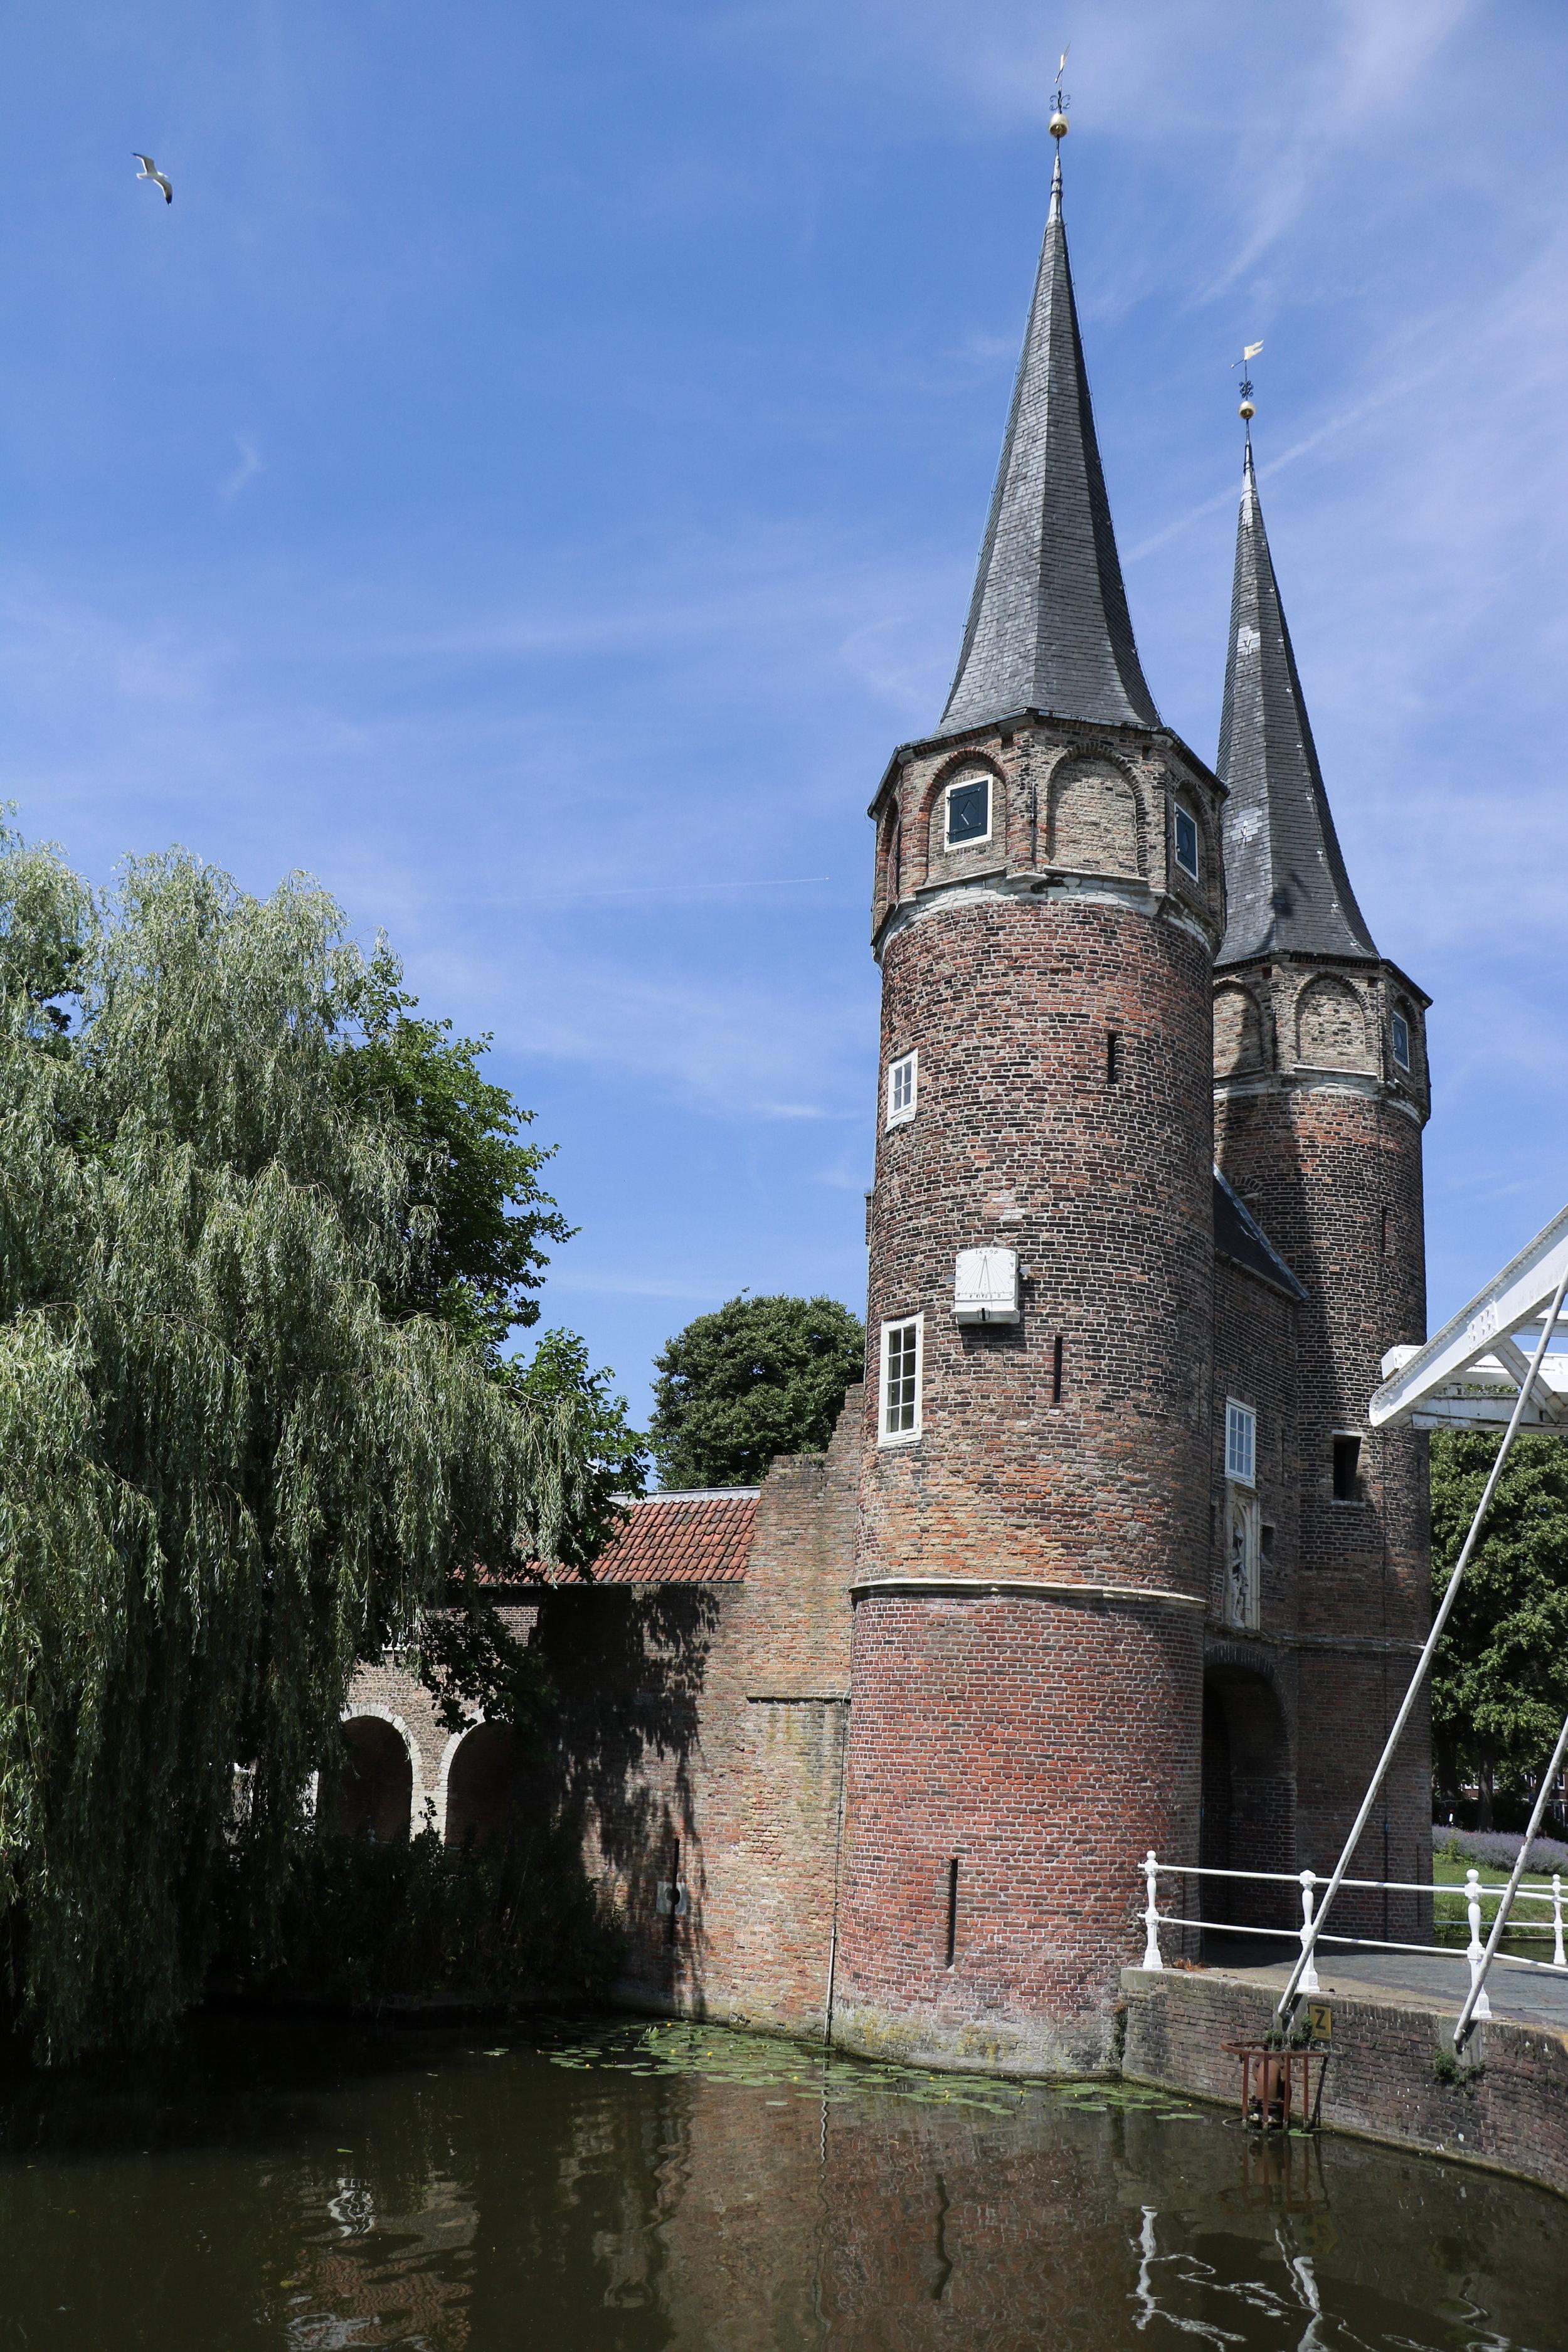 Delft-drawbridge-tower